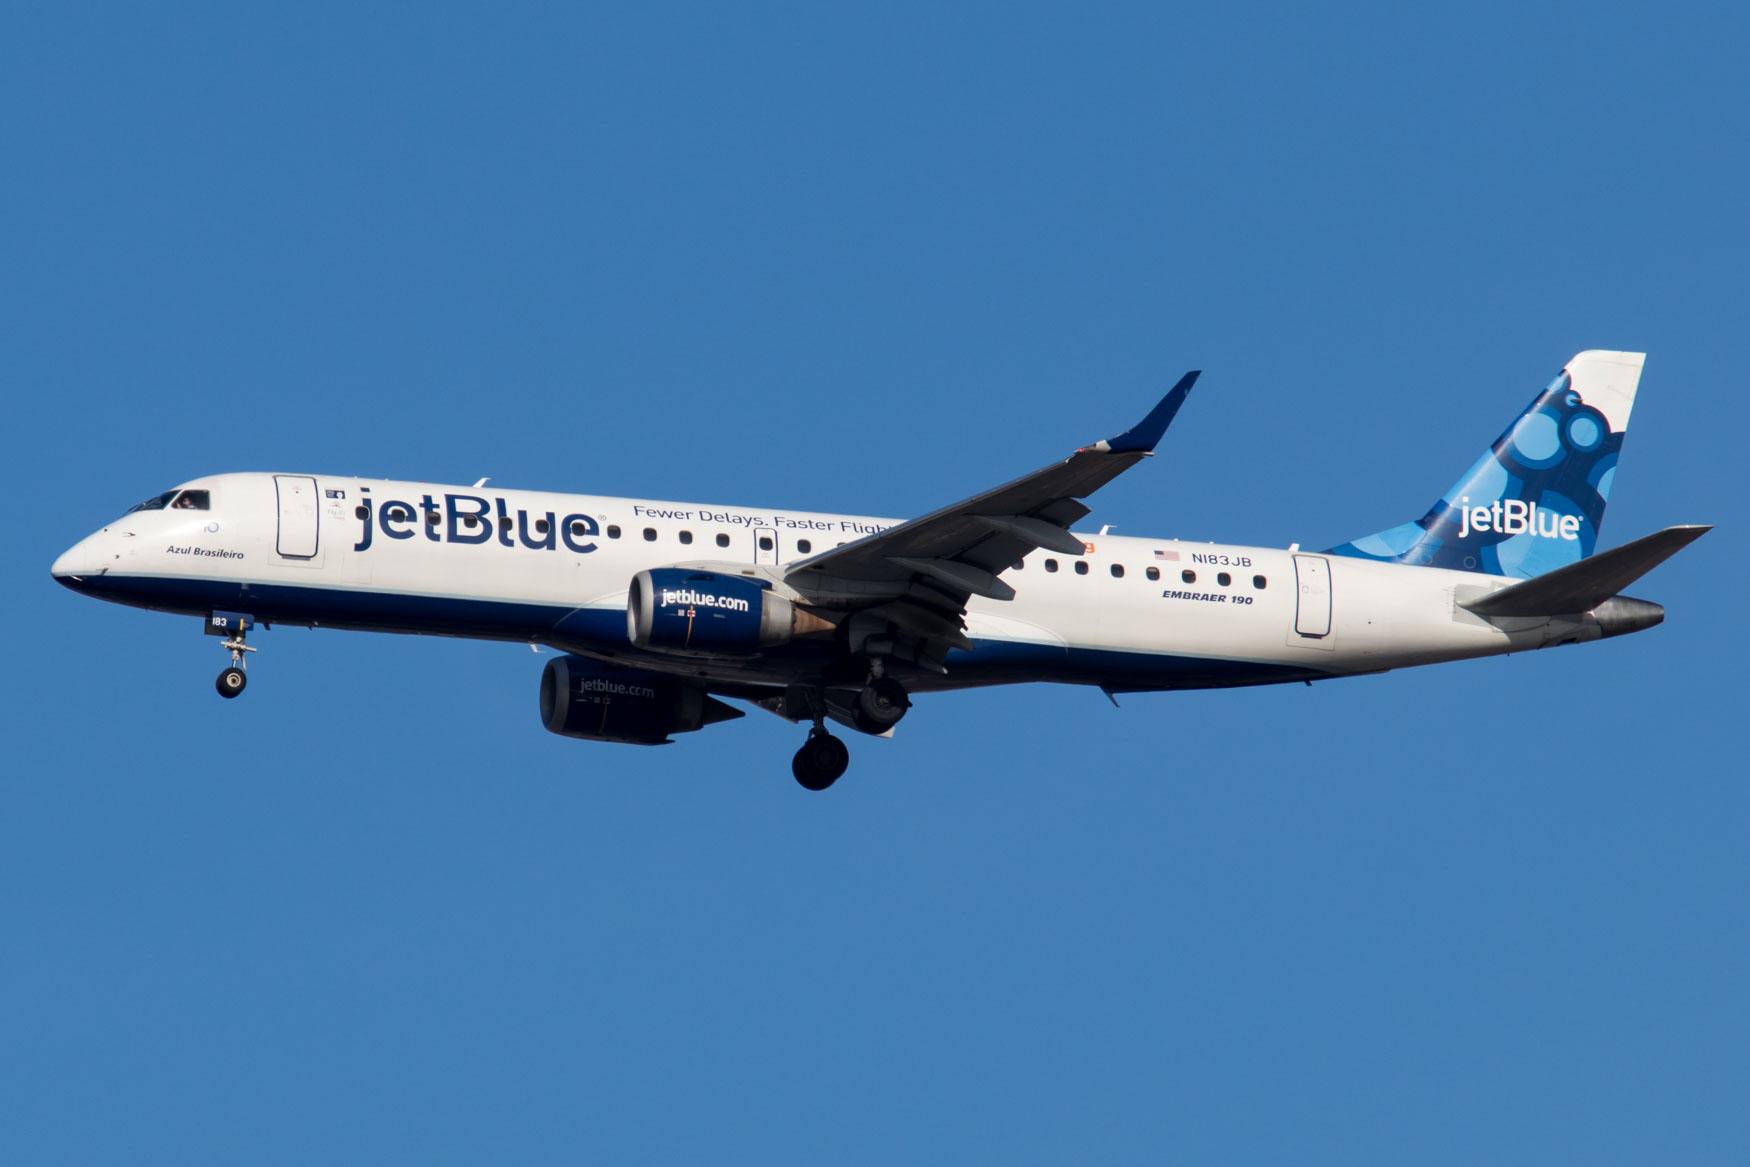 JetBlue Embraer ERJ-190